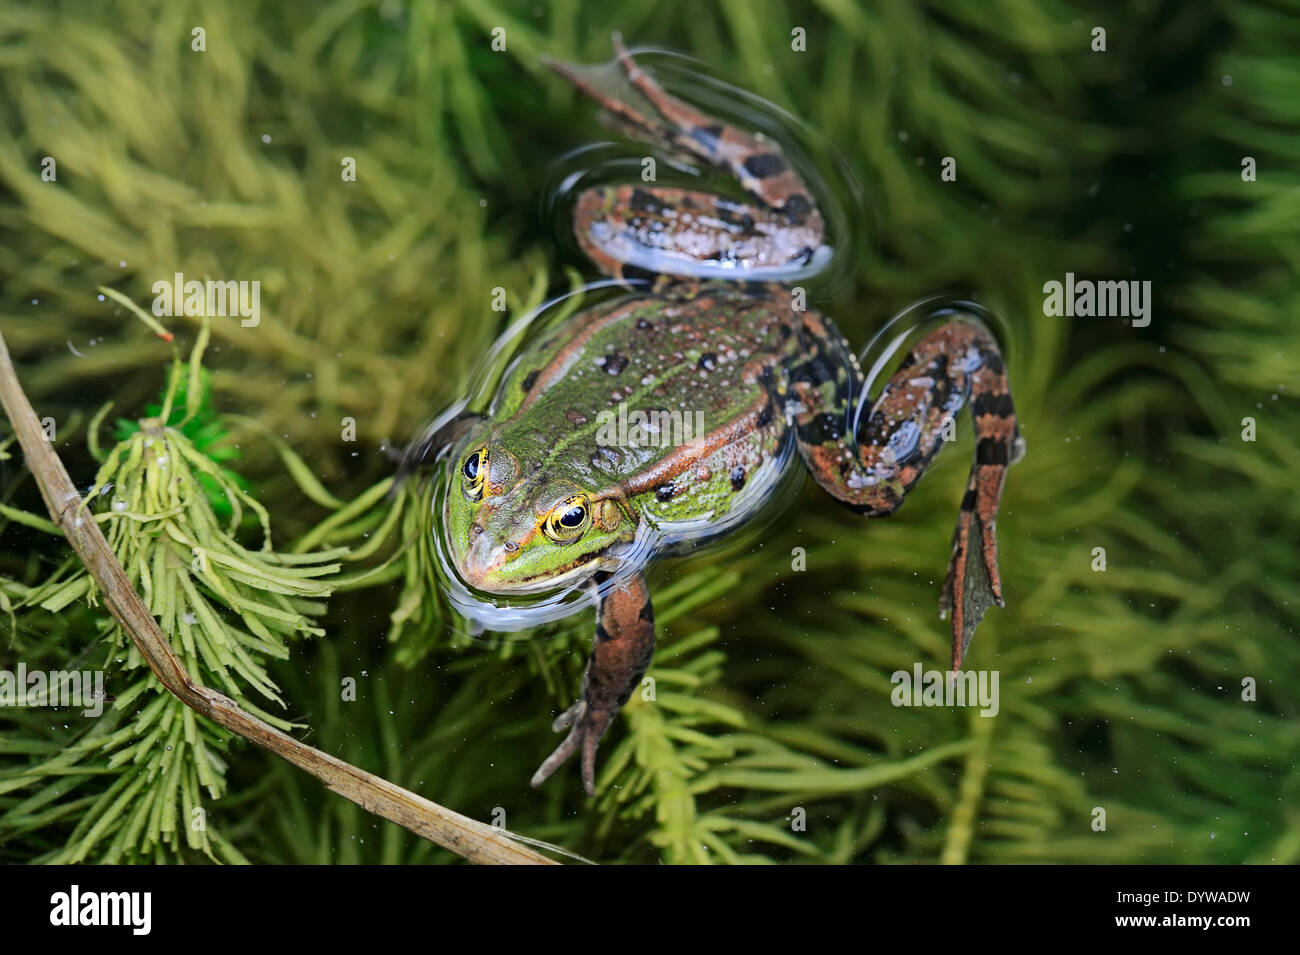 Edible Frog, Common Water Frog or Green Frog (Rana esculenta, Pelophylax kl. esculentus), male, North Rhine-Westphalia, Germany - Stock Image